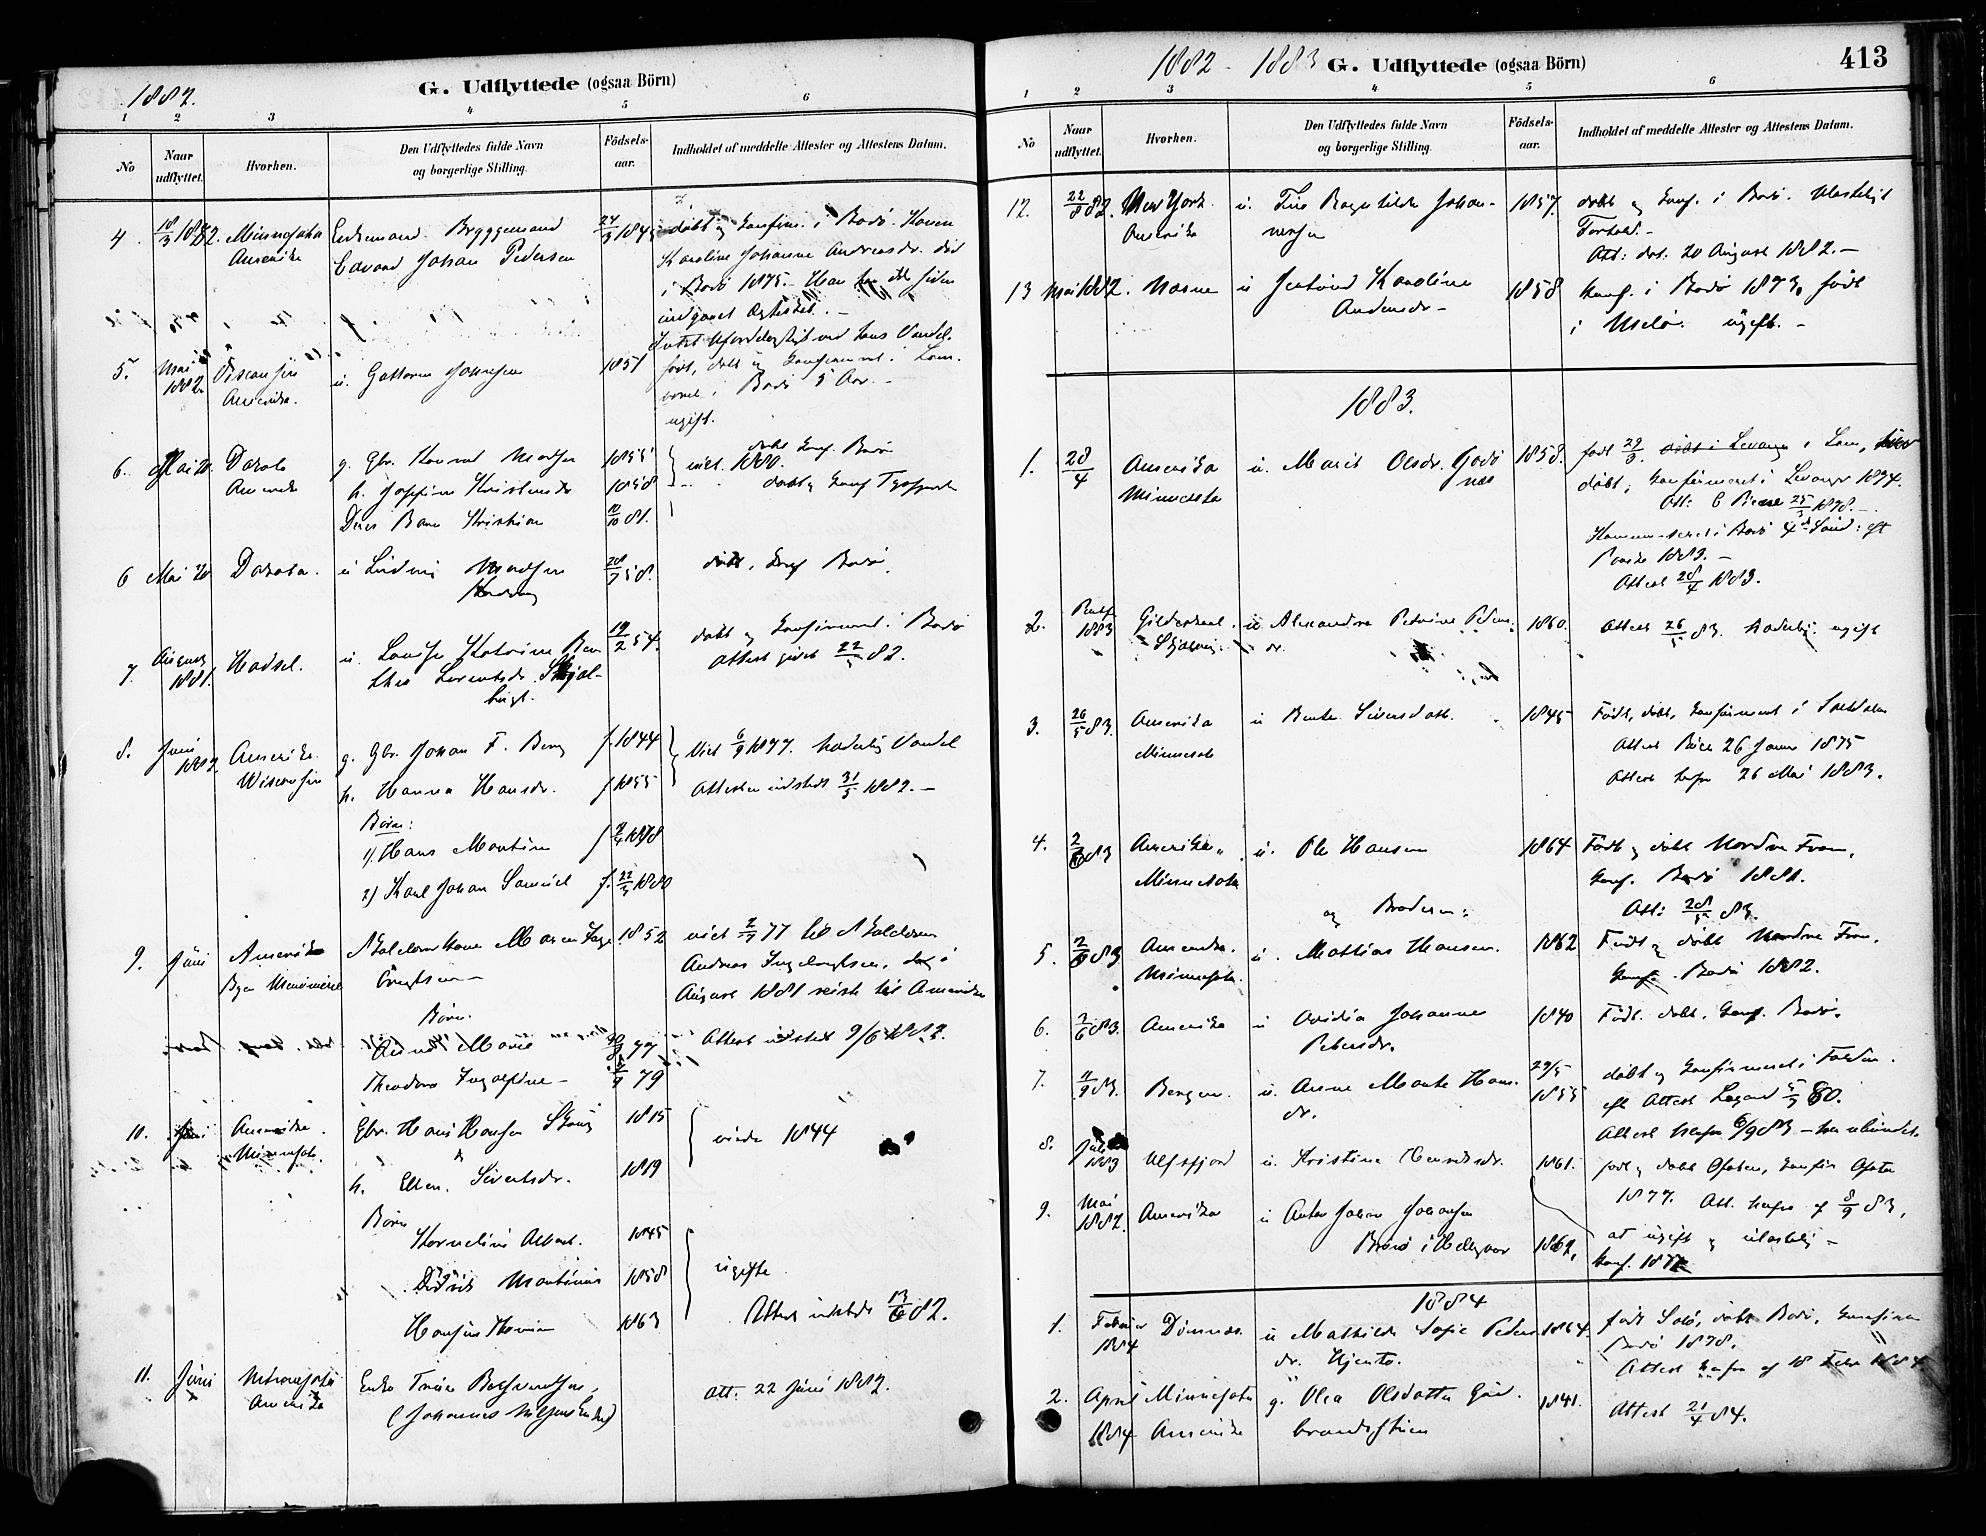 SAT, Ministerialprotokoller, klokkerbøker og fødselsregistre - Nordland, 802/L0054: Ministerialbok nr. 802A01, 1879-1893, s. 413